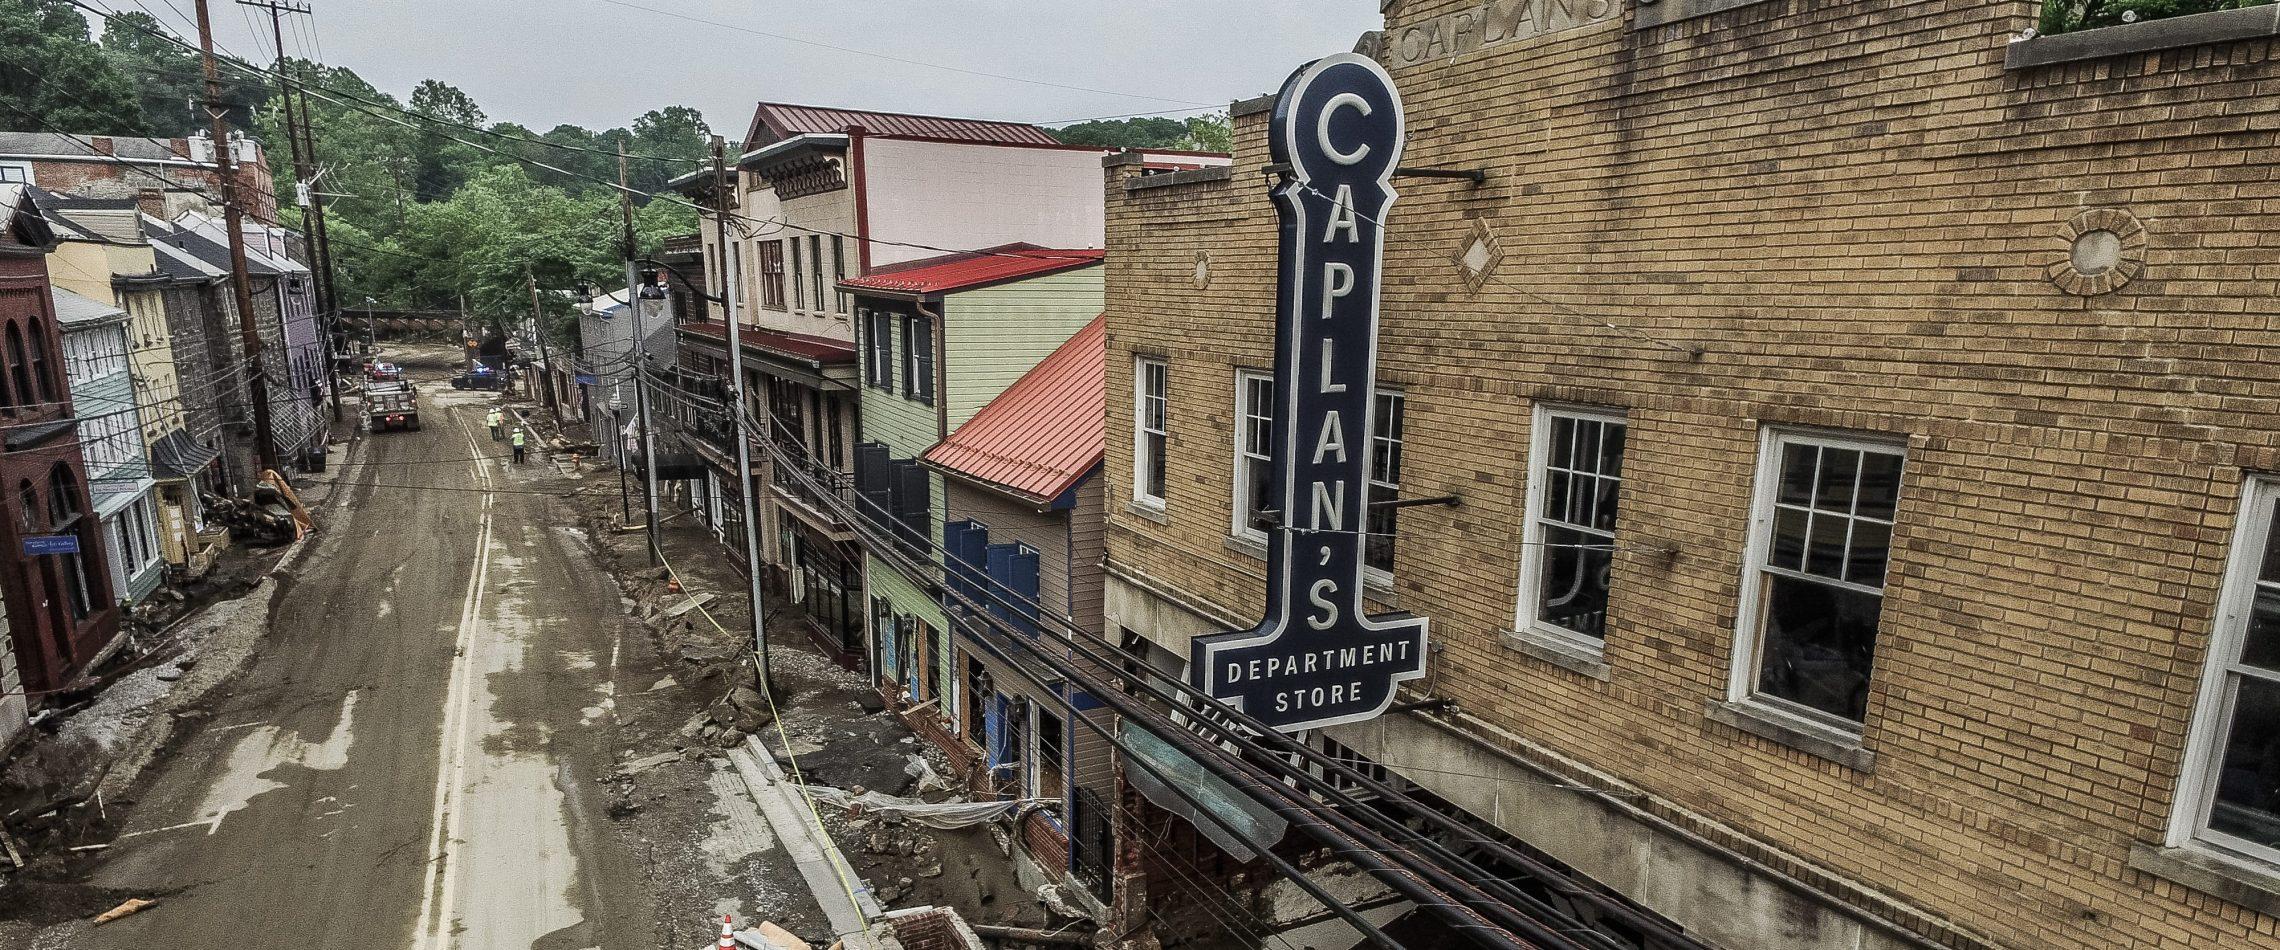 Ellicott City Maryland after the flood